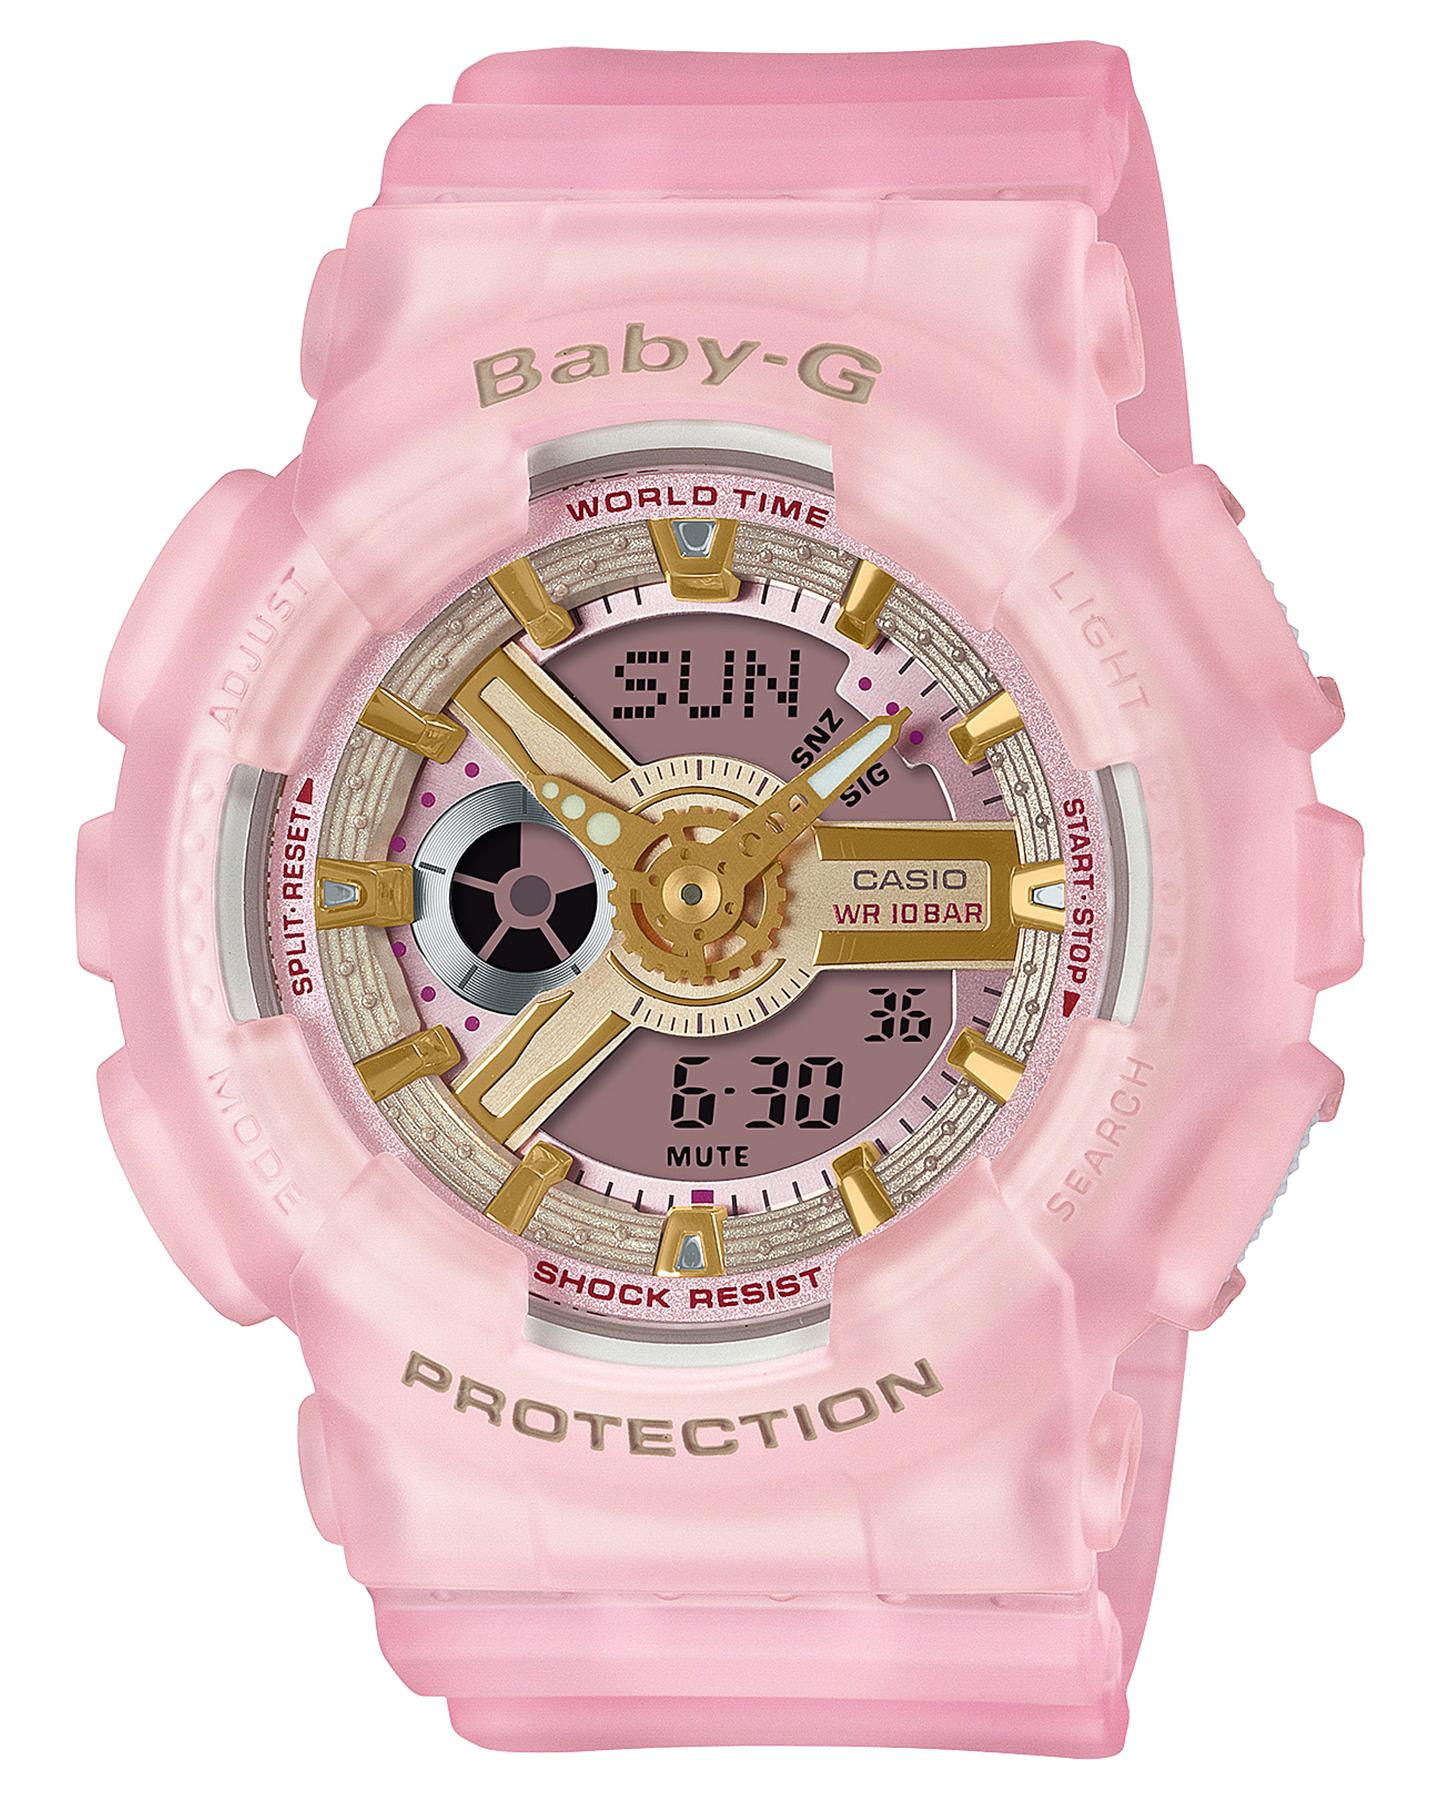 Baby G Ba110 Sea Glass Series Watch Pink